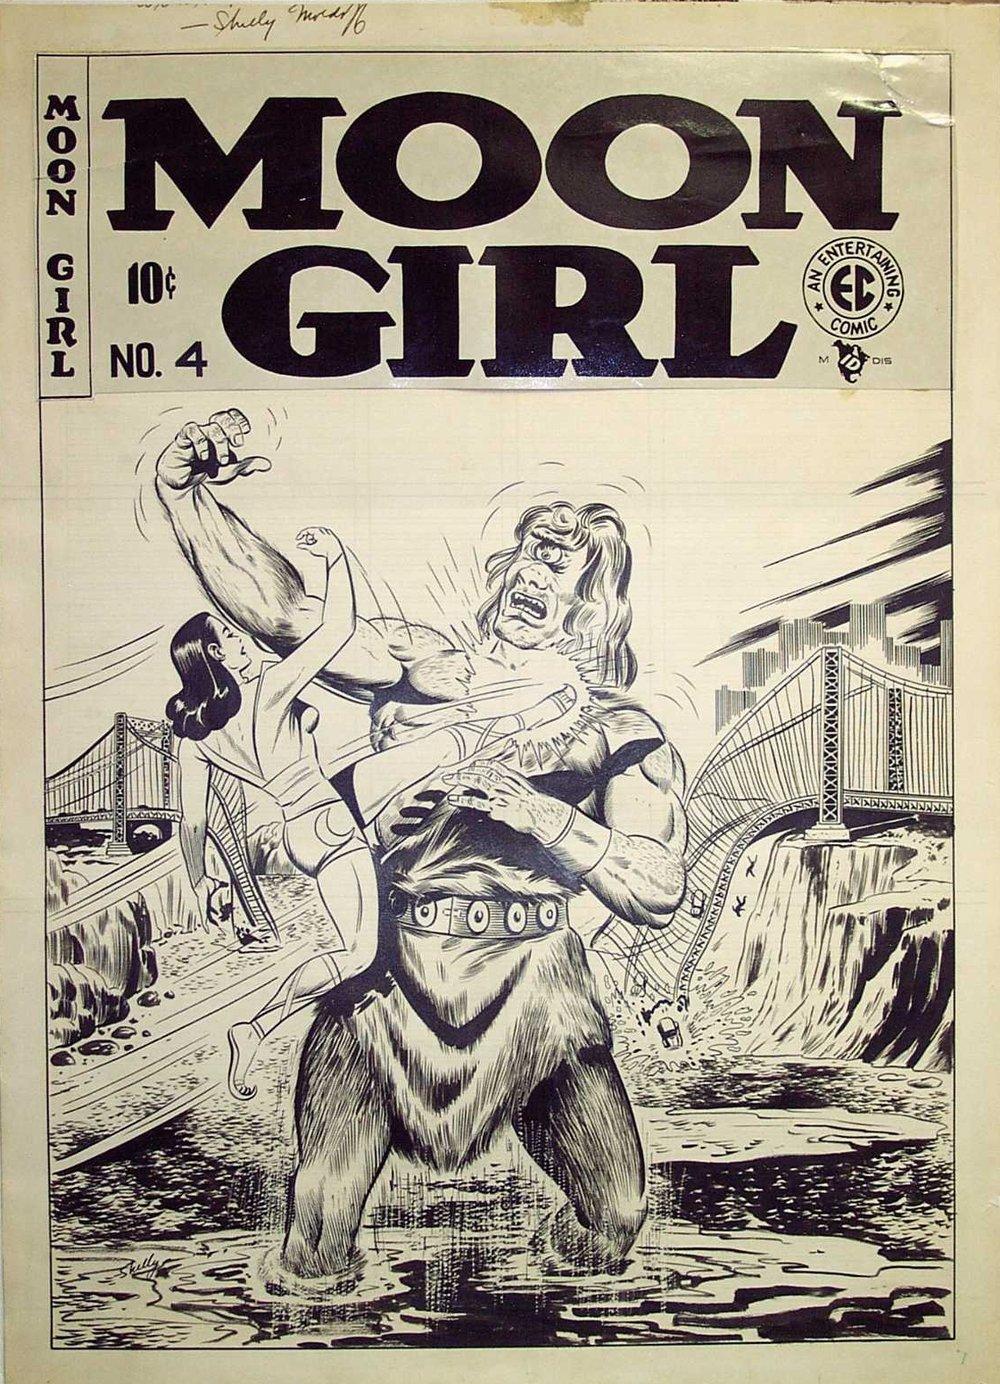 Moon Girl #4 original cover art by Sheldon Moldoff.